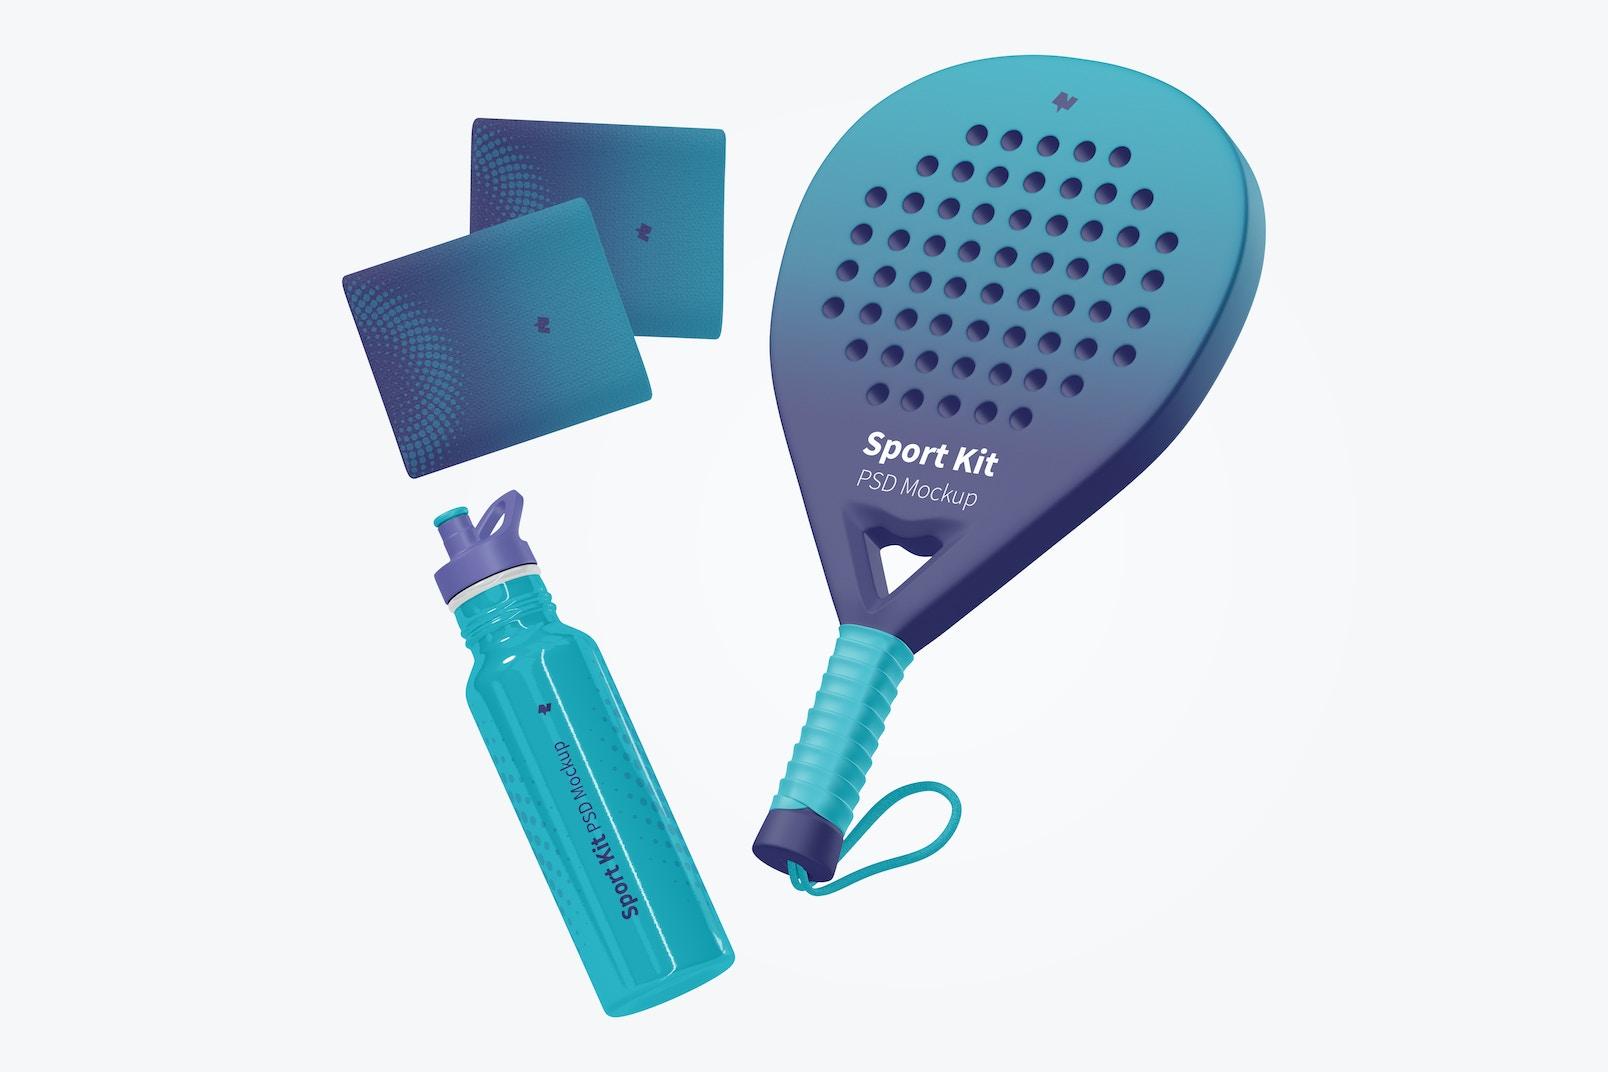 Sport Kit Mockup, Floating